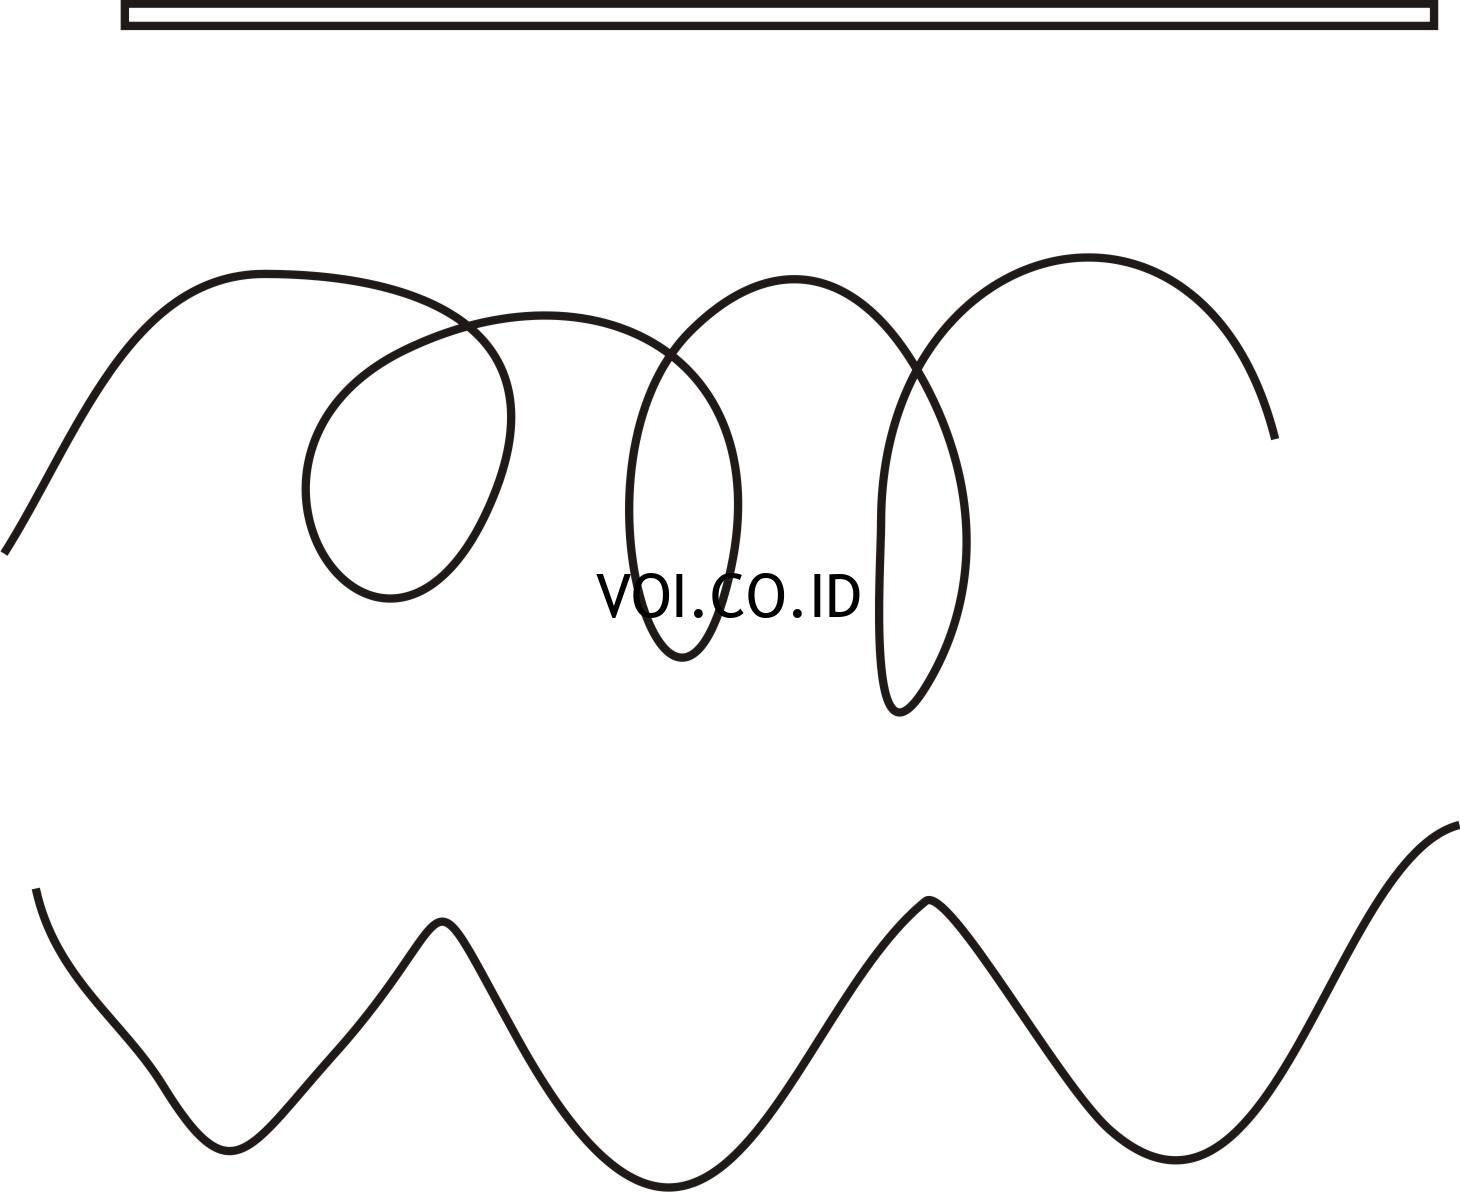 Unsur-Unsur-Seni-Rupa-3-Dimensi